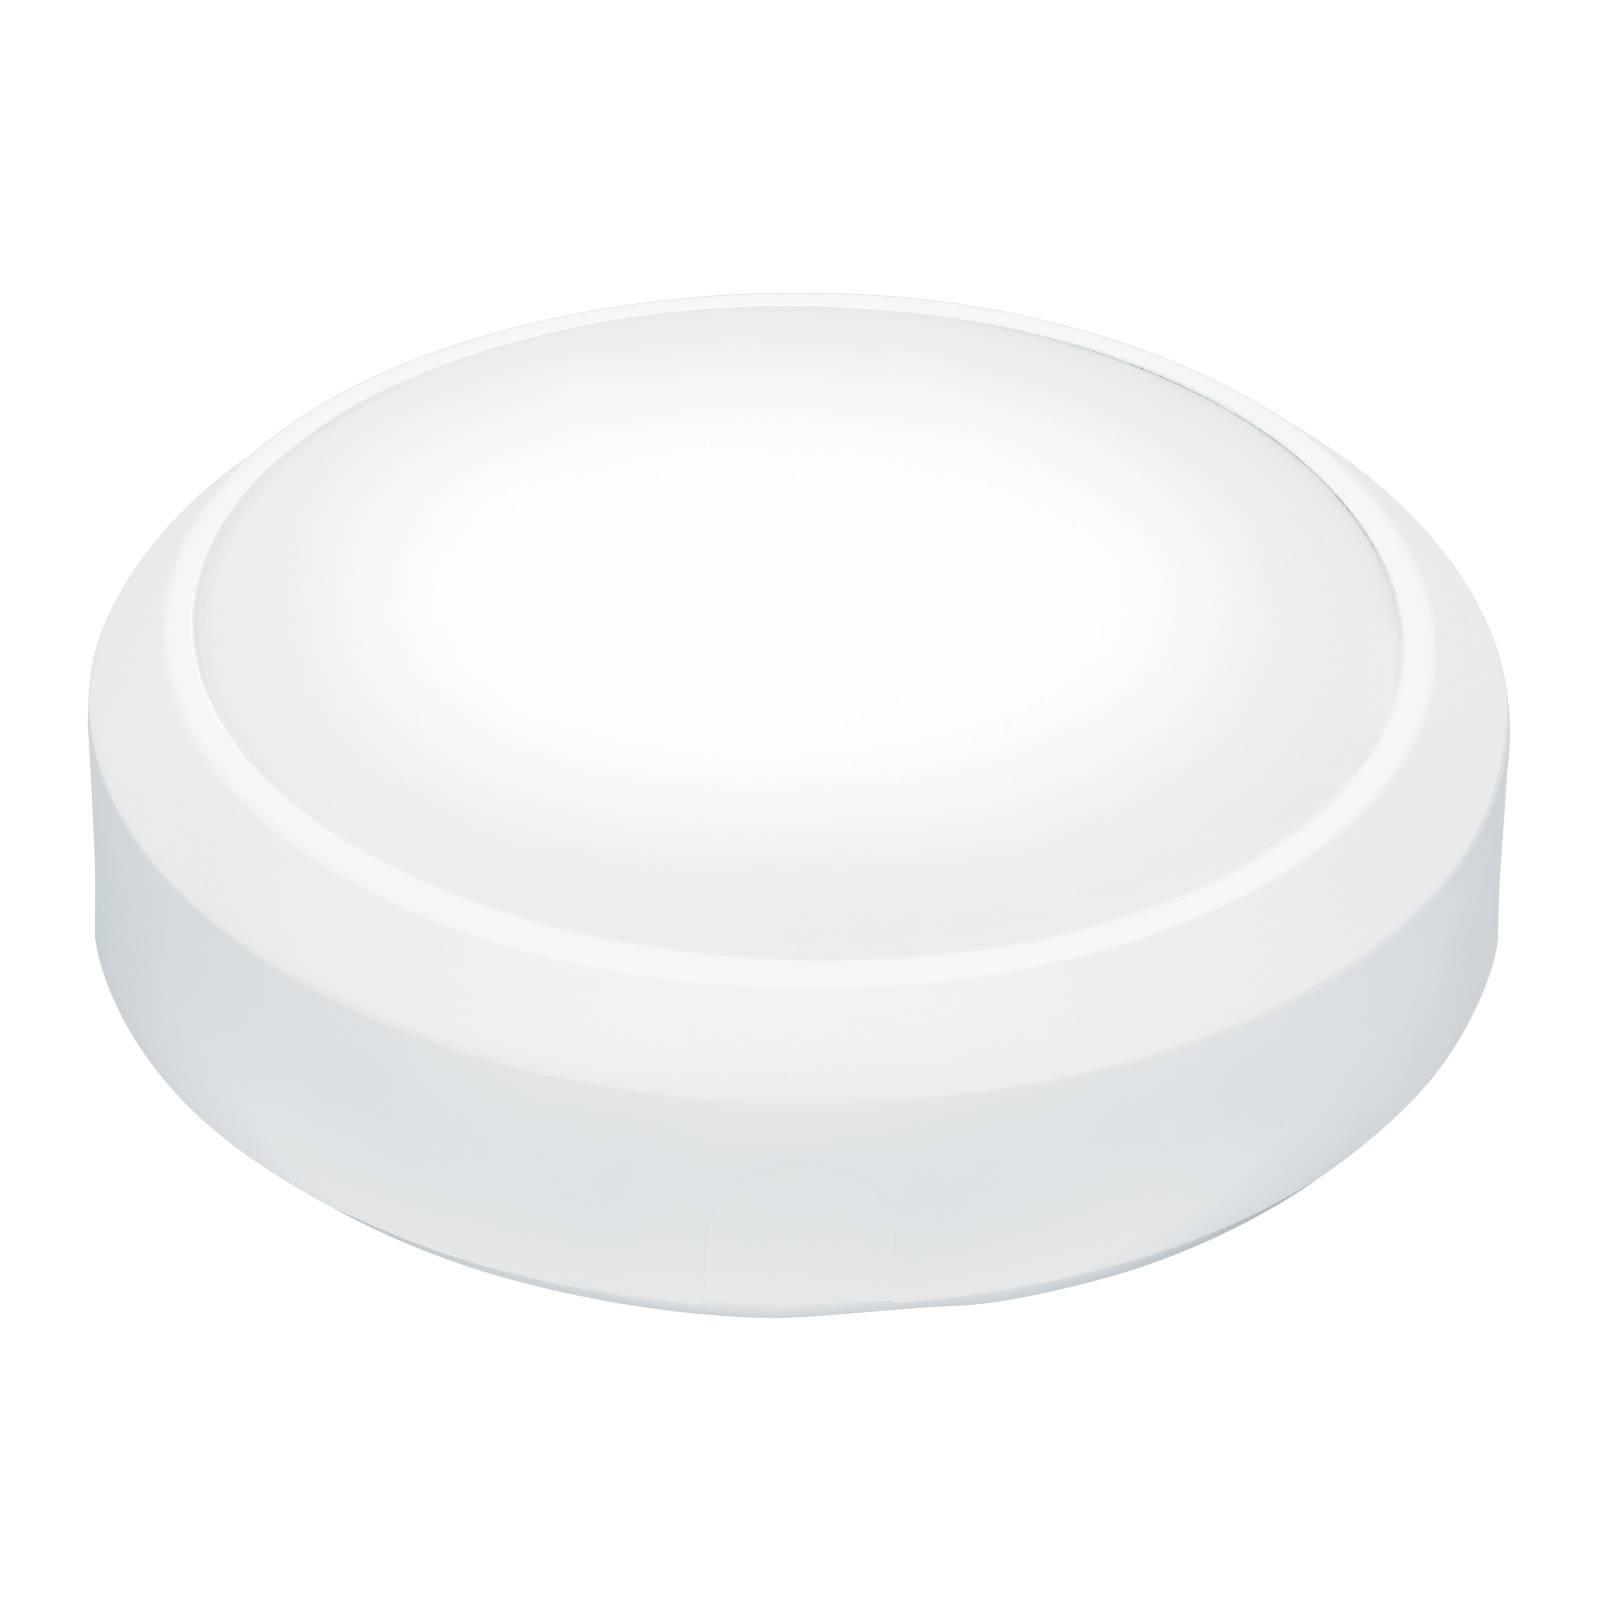 THORNeco Lara LED-Wandleuchte Ø 33cm Dekoring weiß